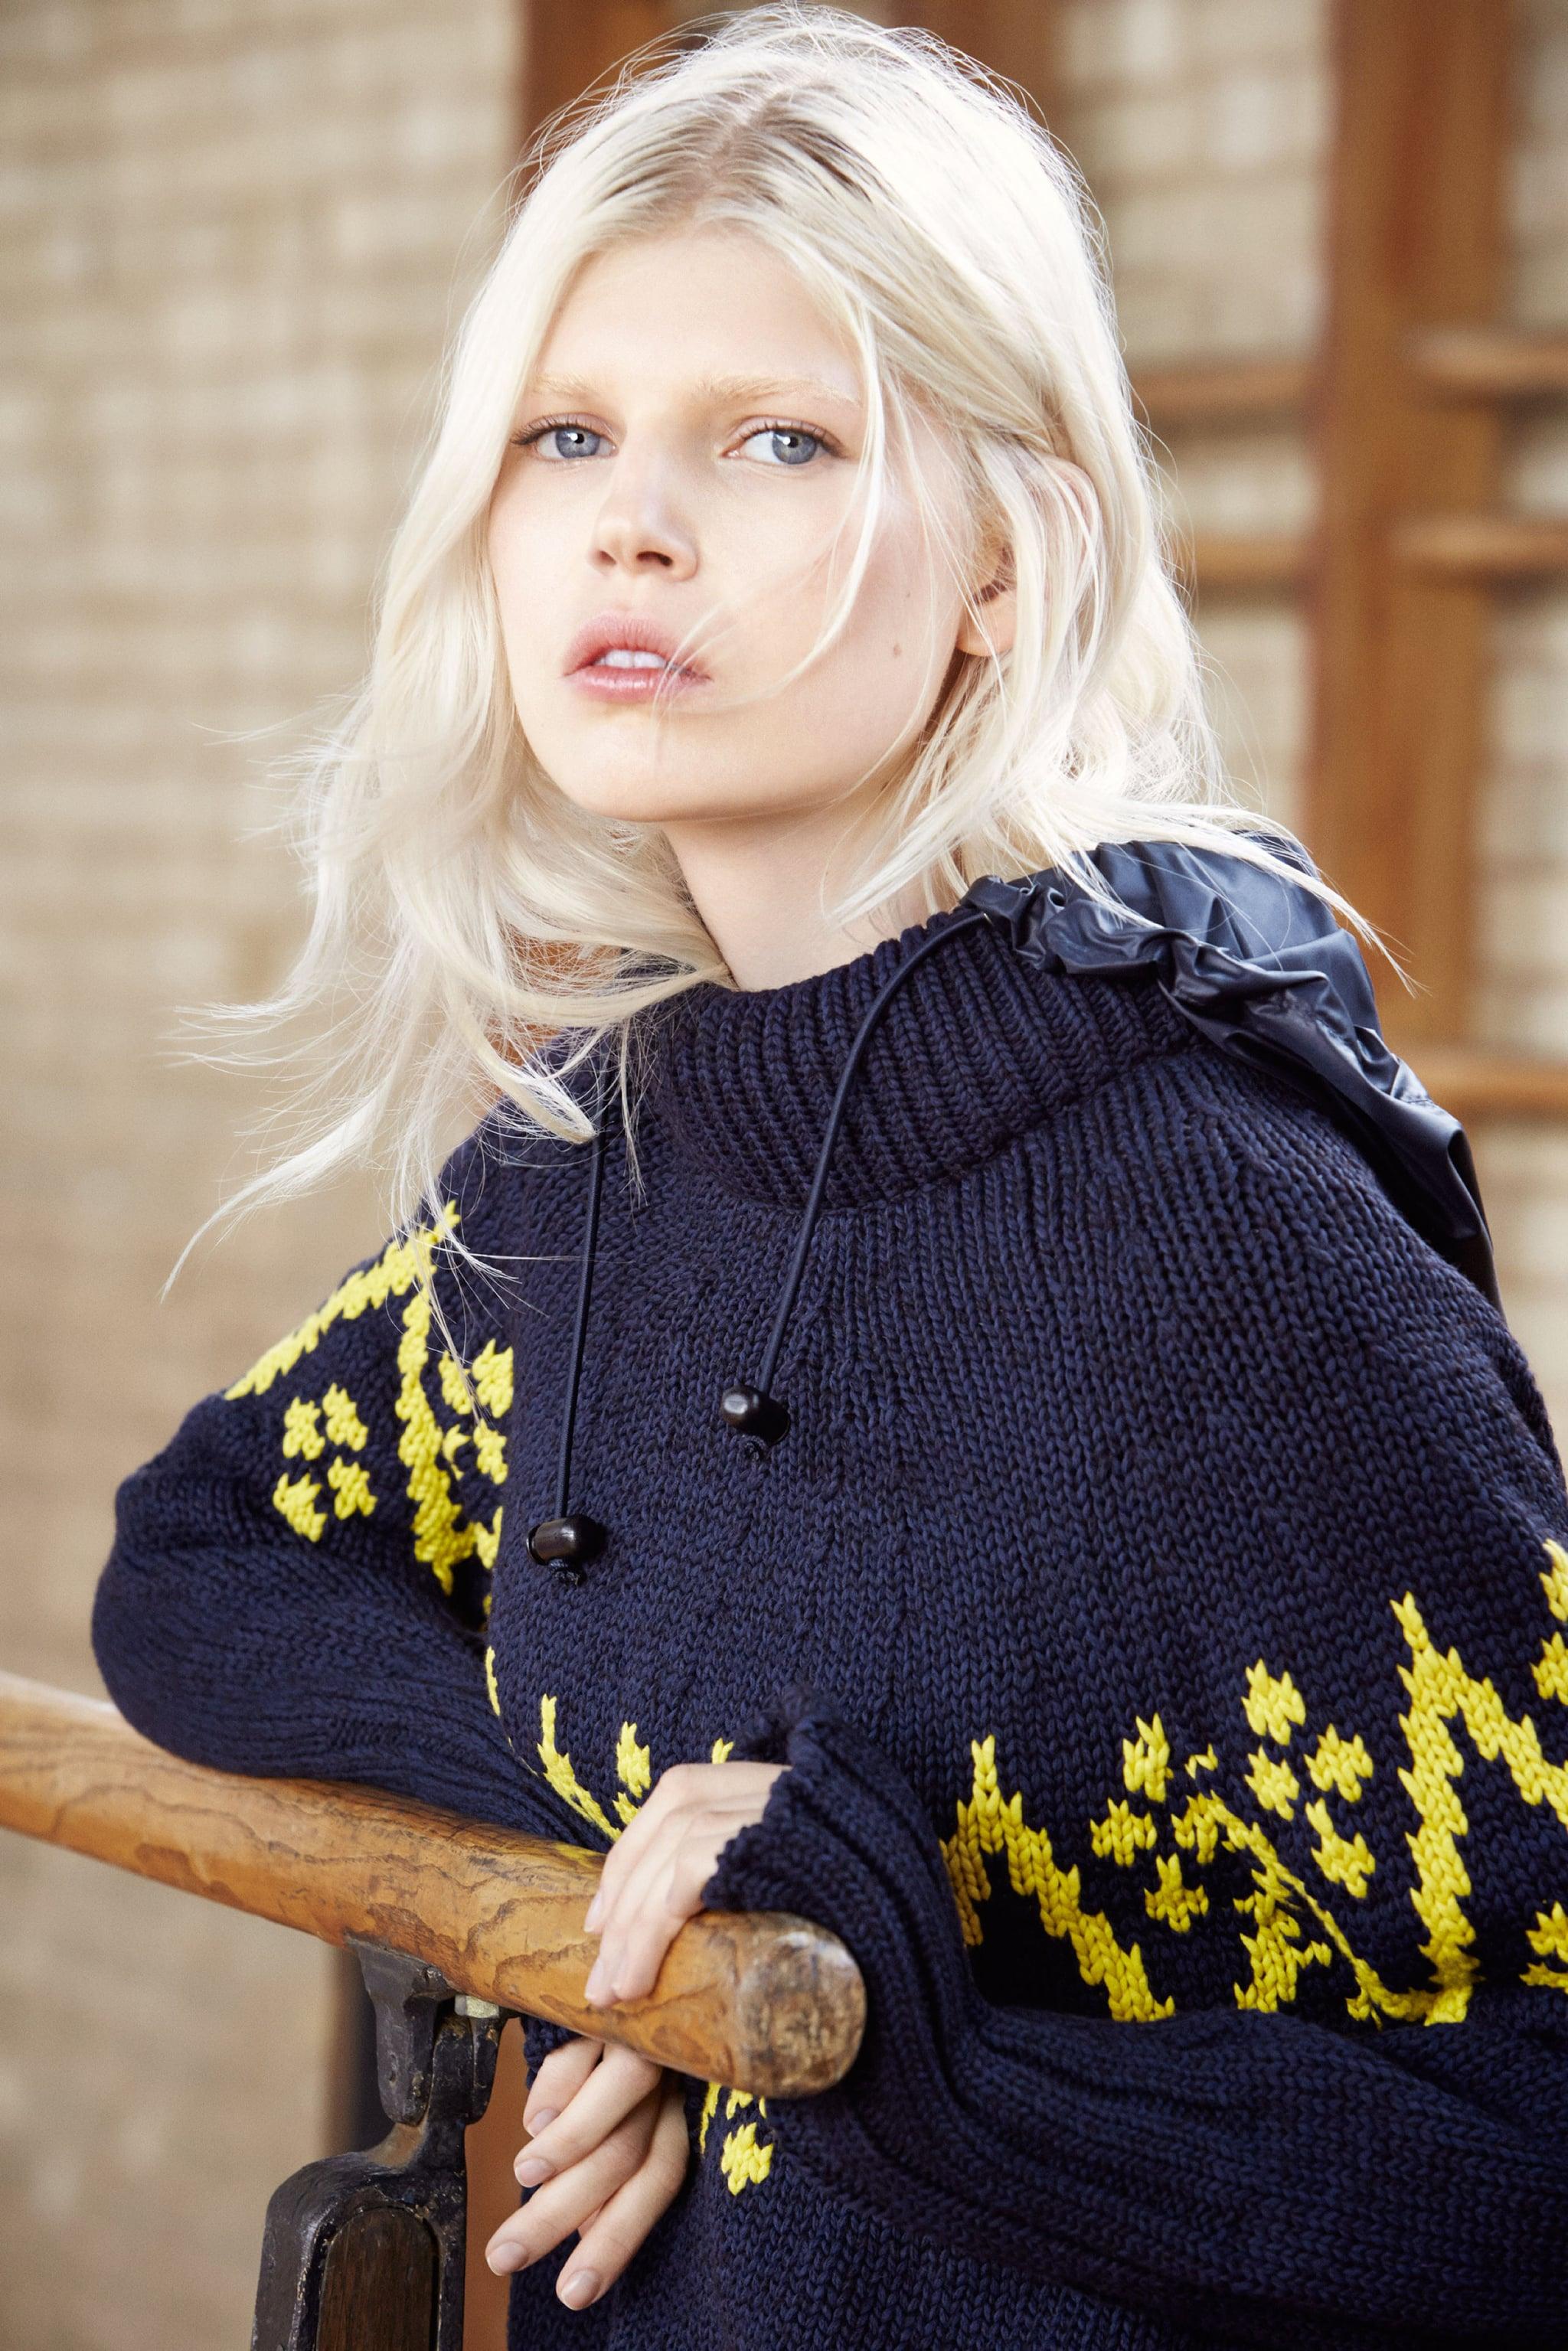 Zara TRF Fall 2014